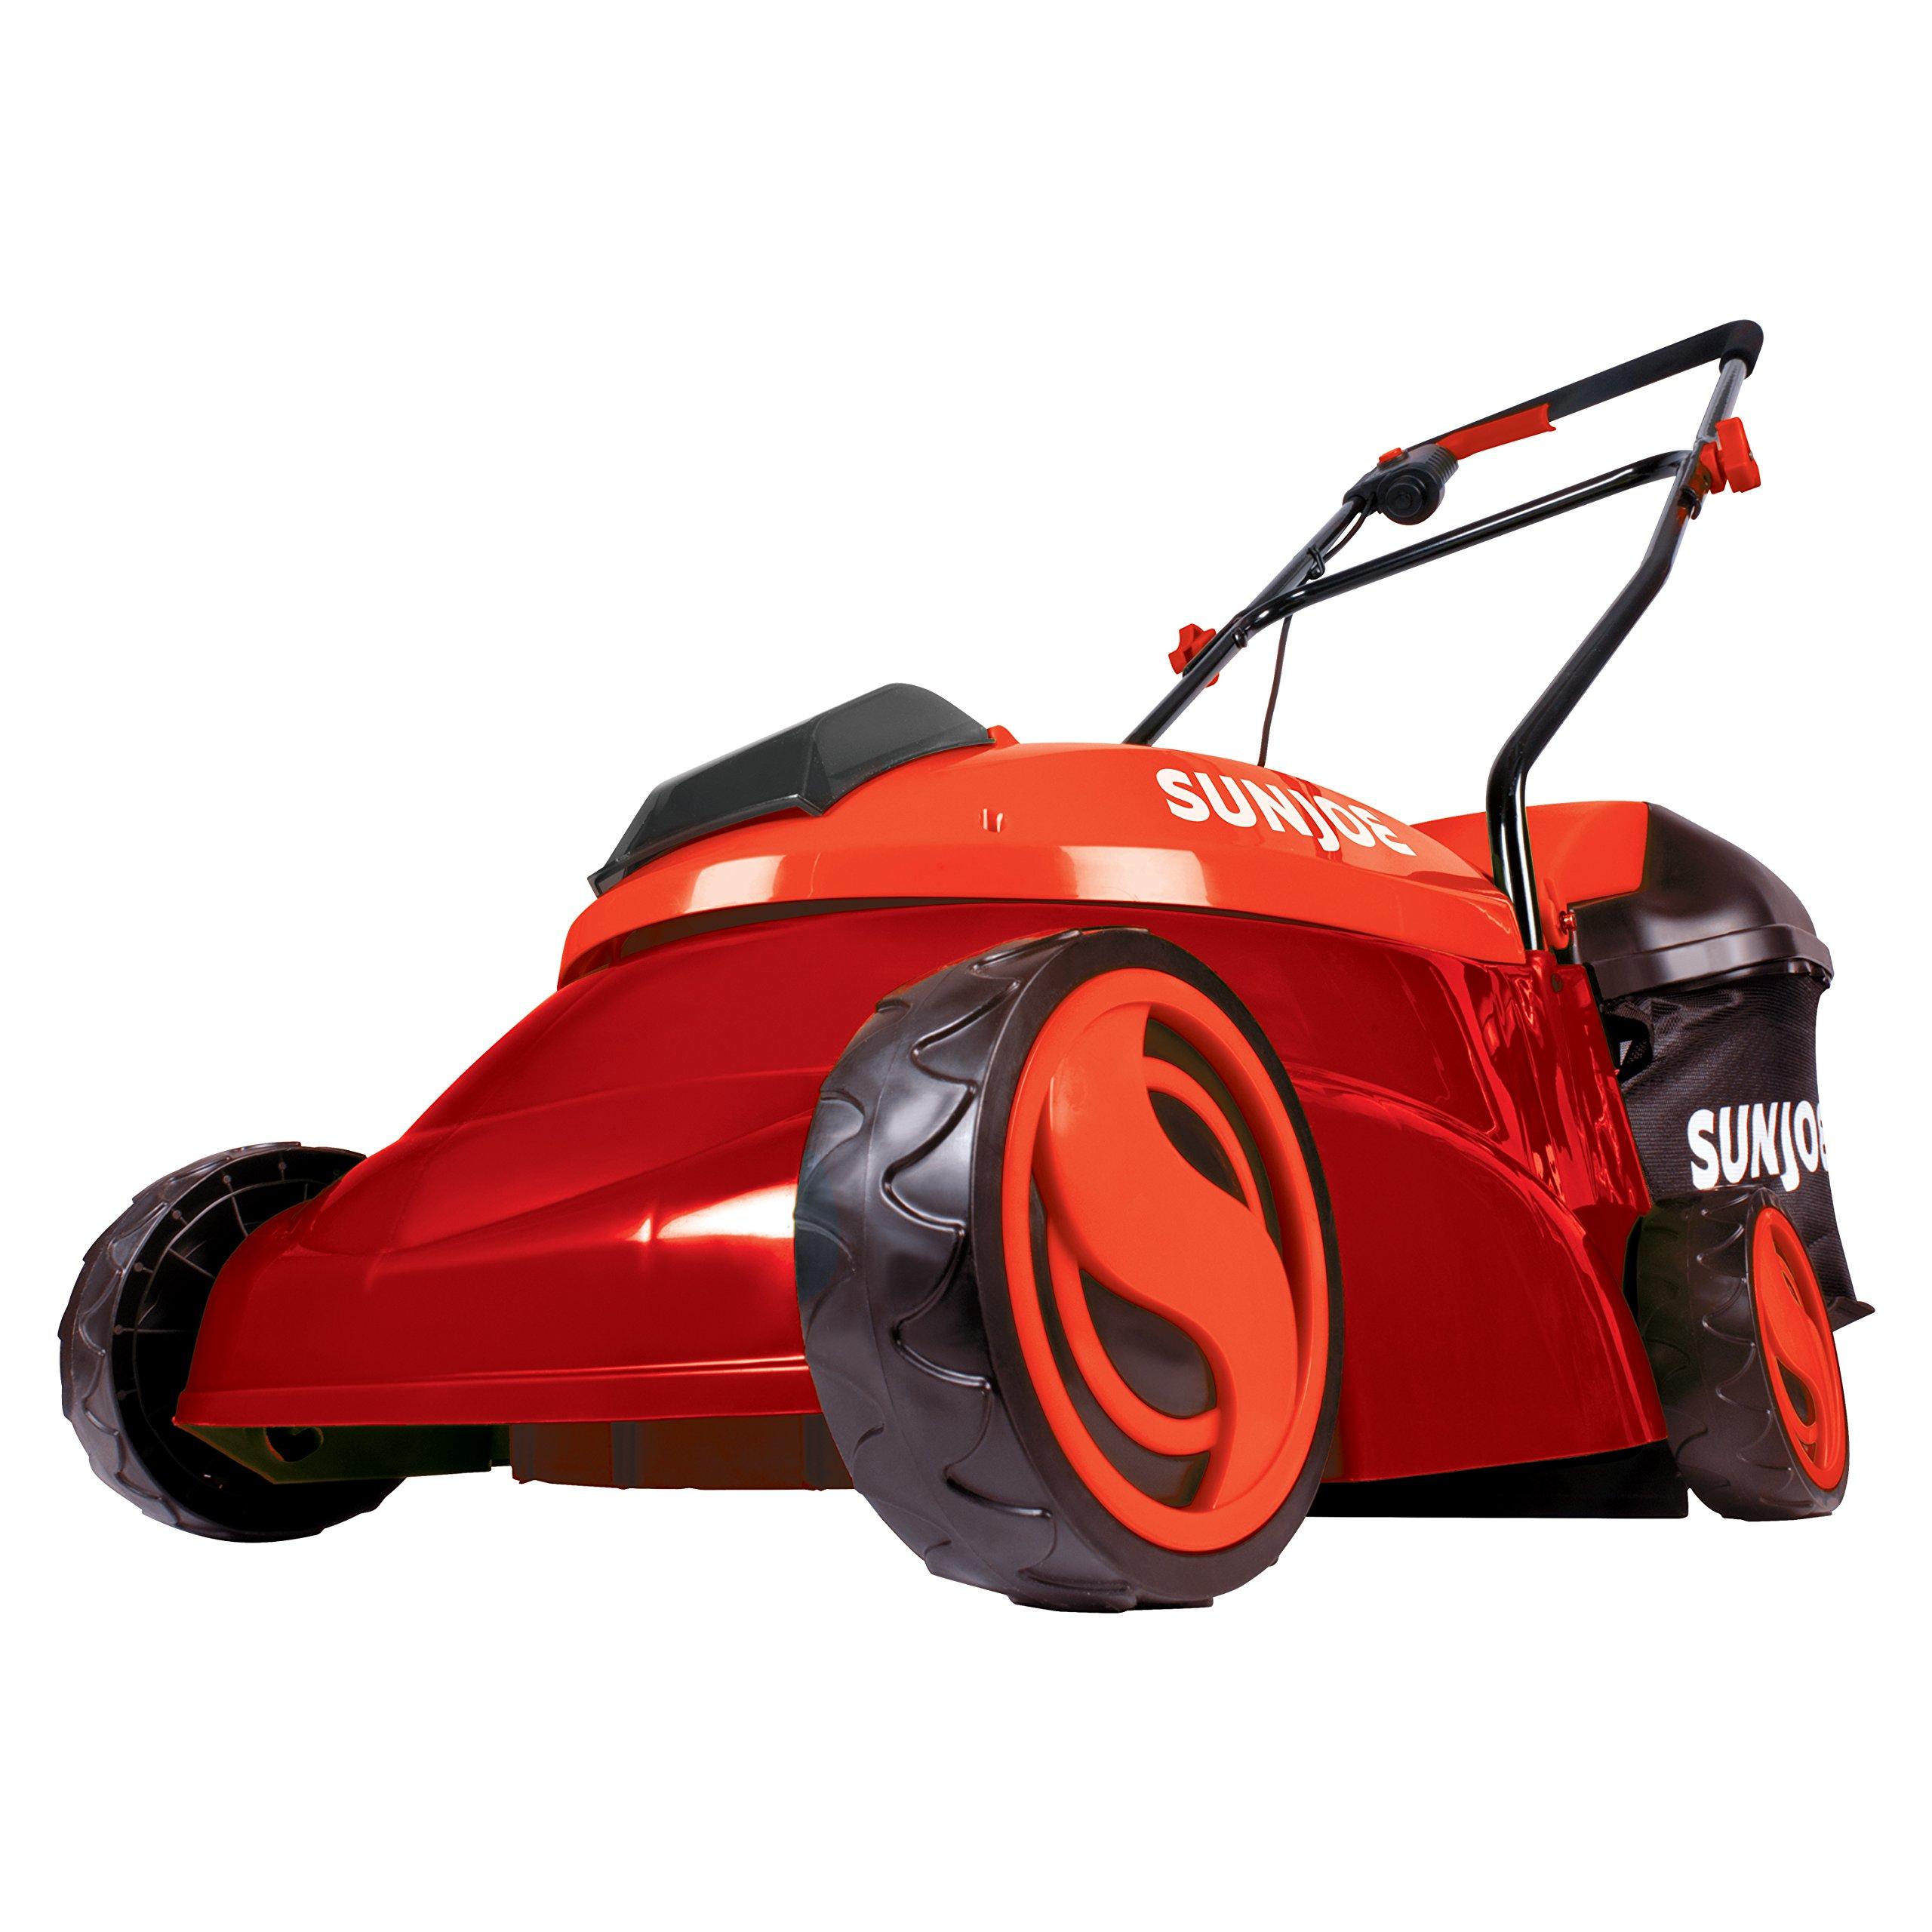 Sun Joe MJ401C-XR-RED 14-Inch 28V 5 Ah Cordless Lawn Mower w/Brushless Motor, Red by Sun Joe